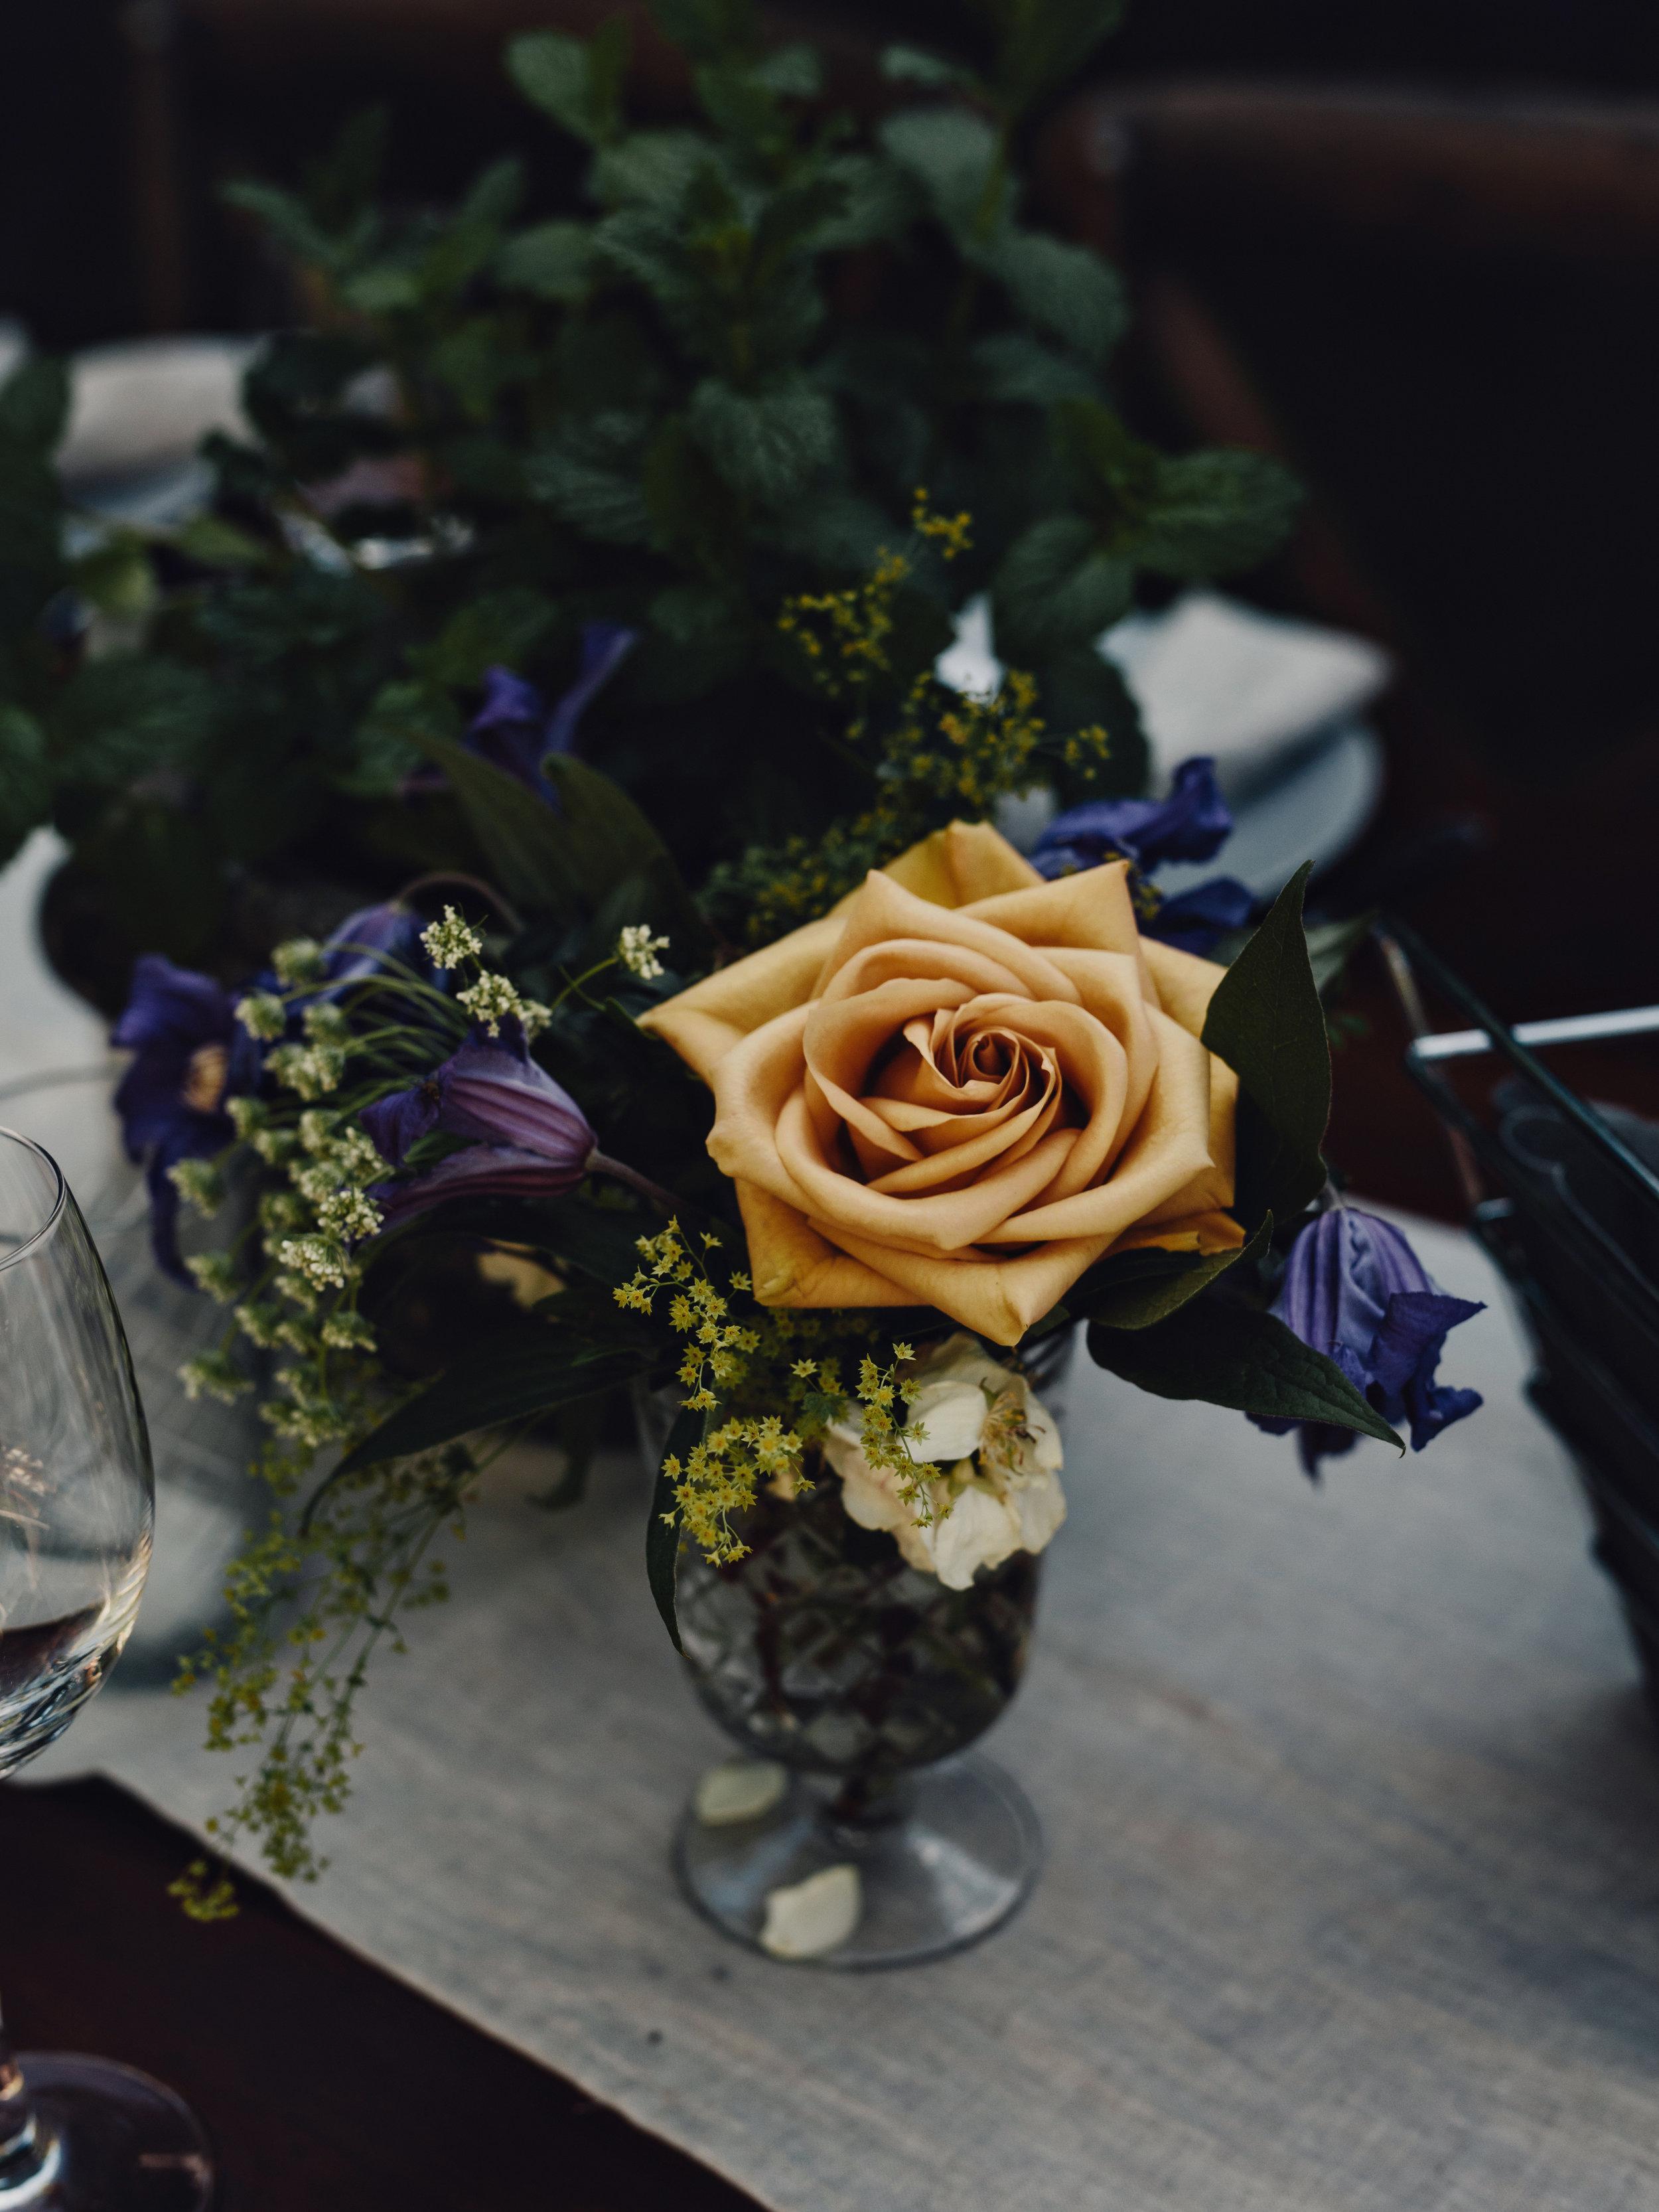 VictoriaBC-FrenchKiss-Events-Wedding-Photos-5.jpg